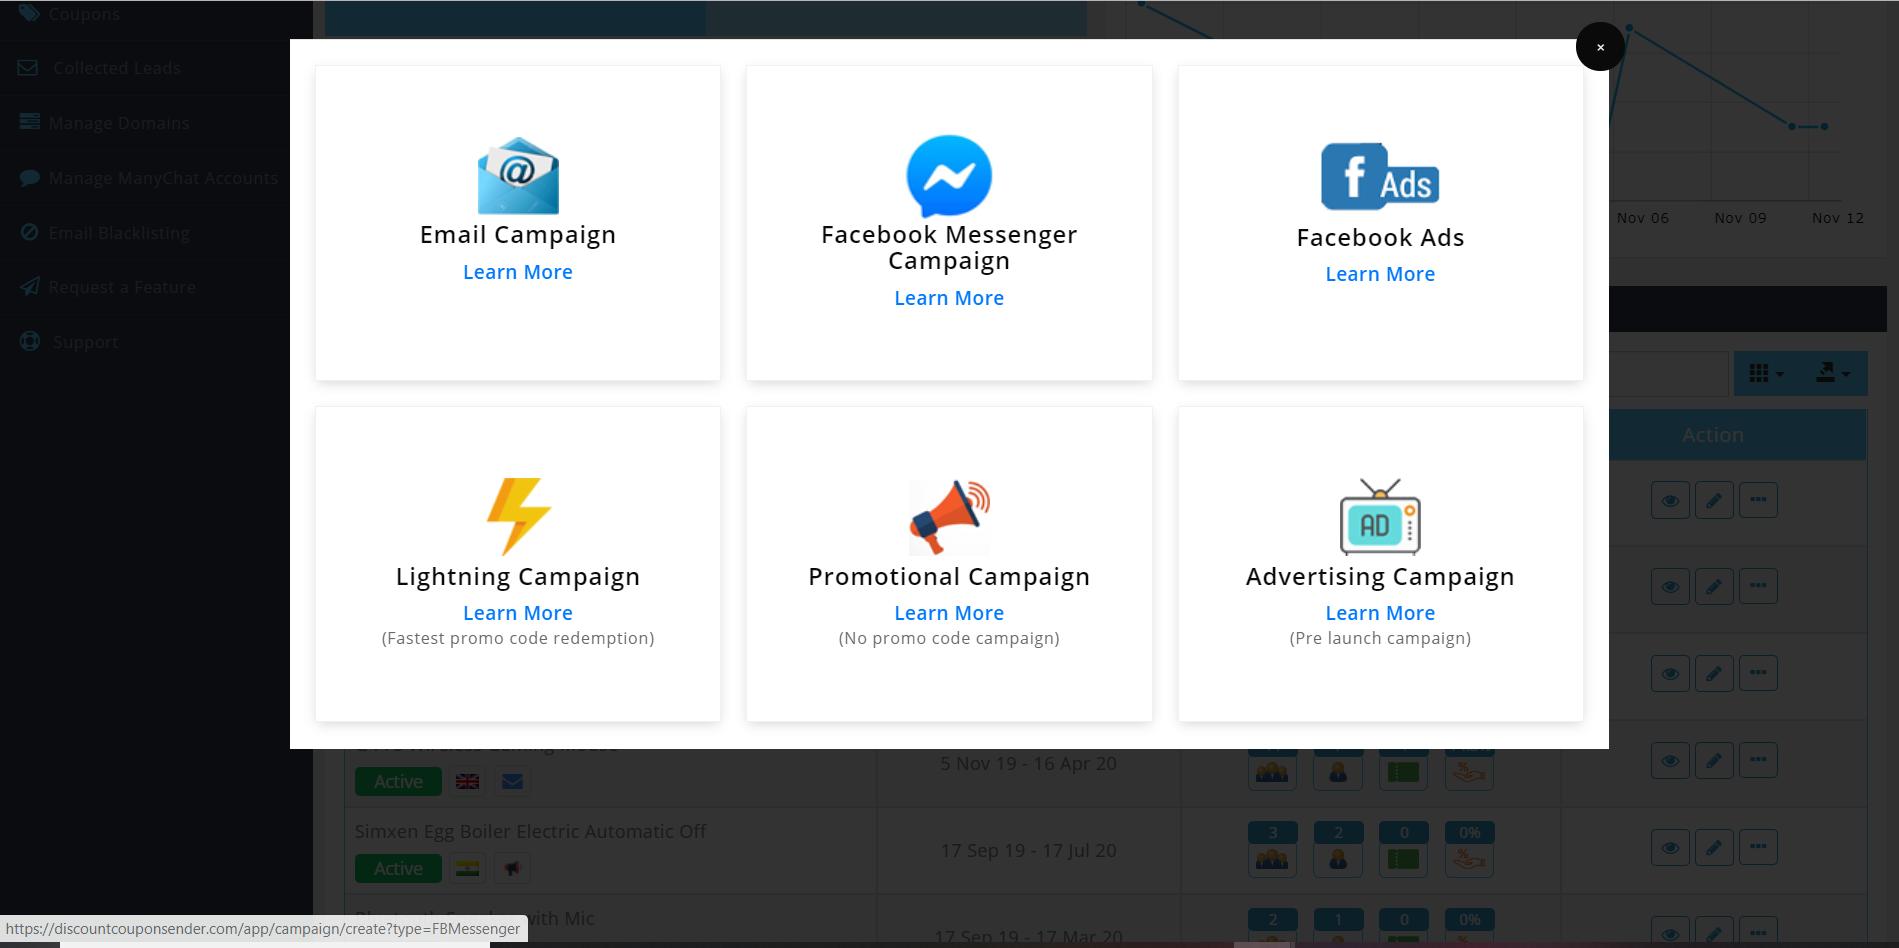 Discount Coupon Sender campaign screenshot